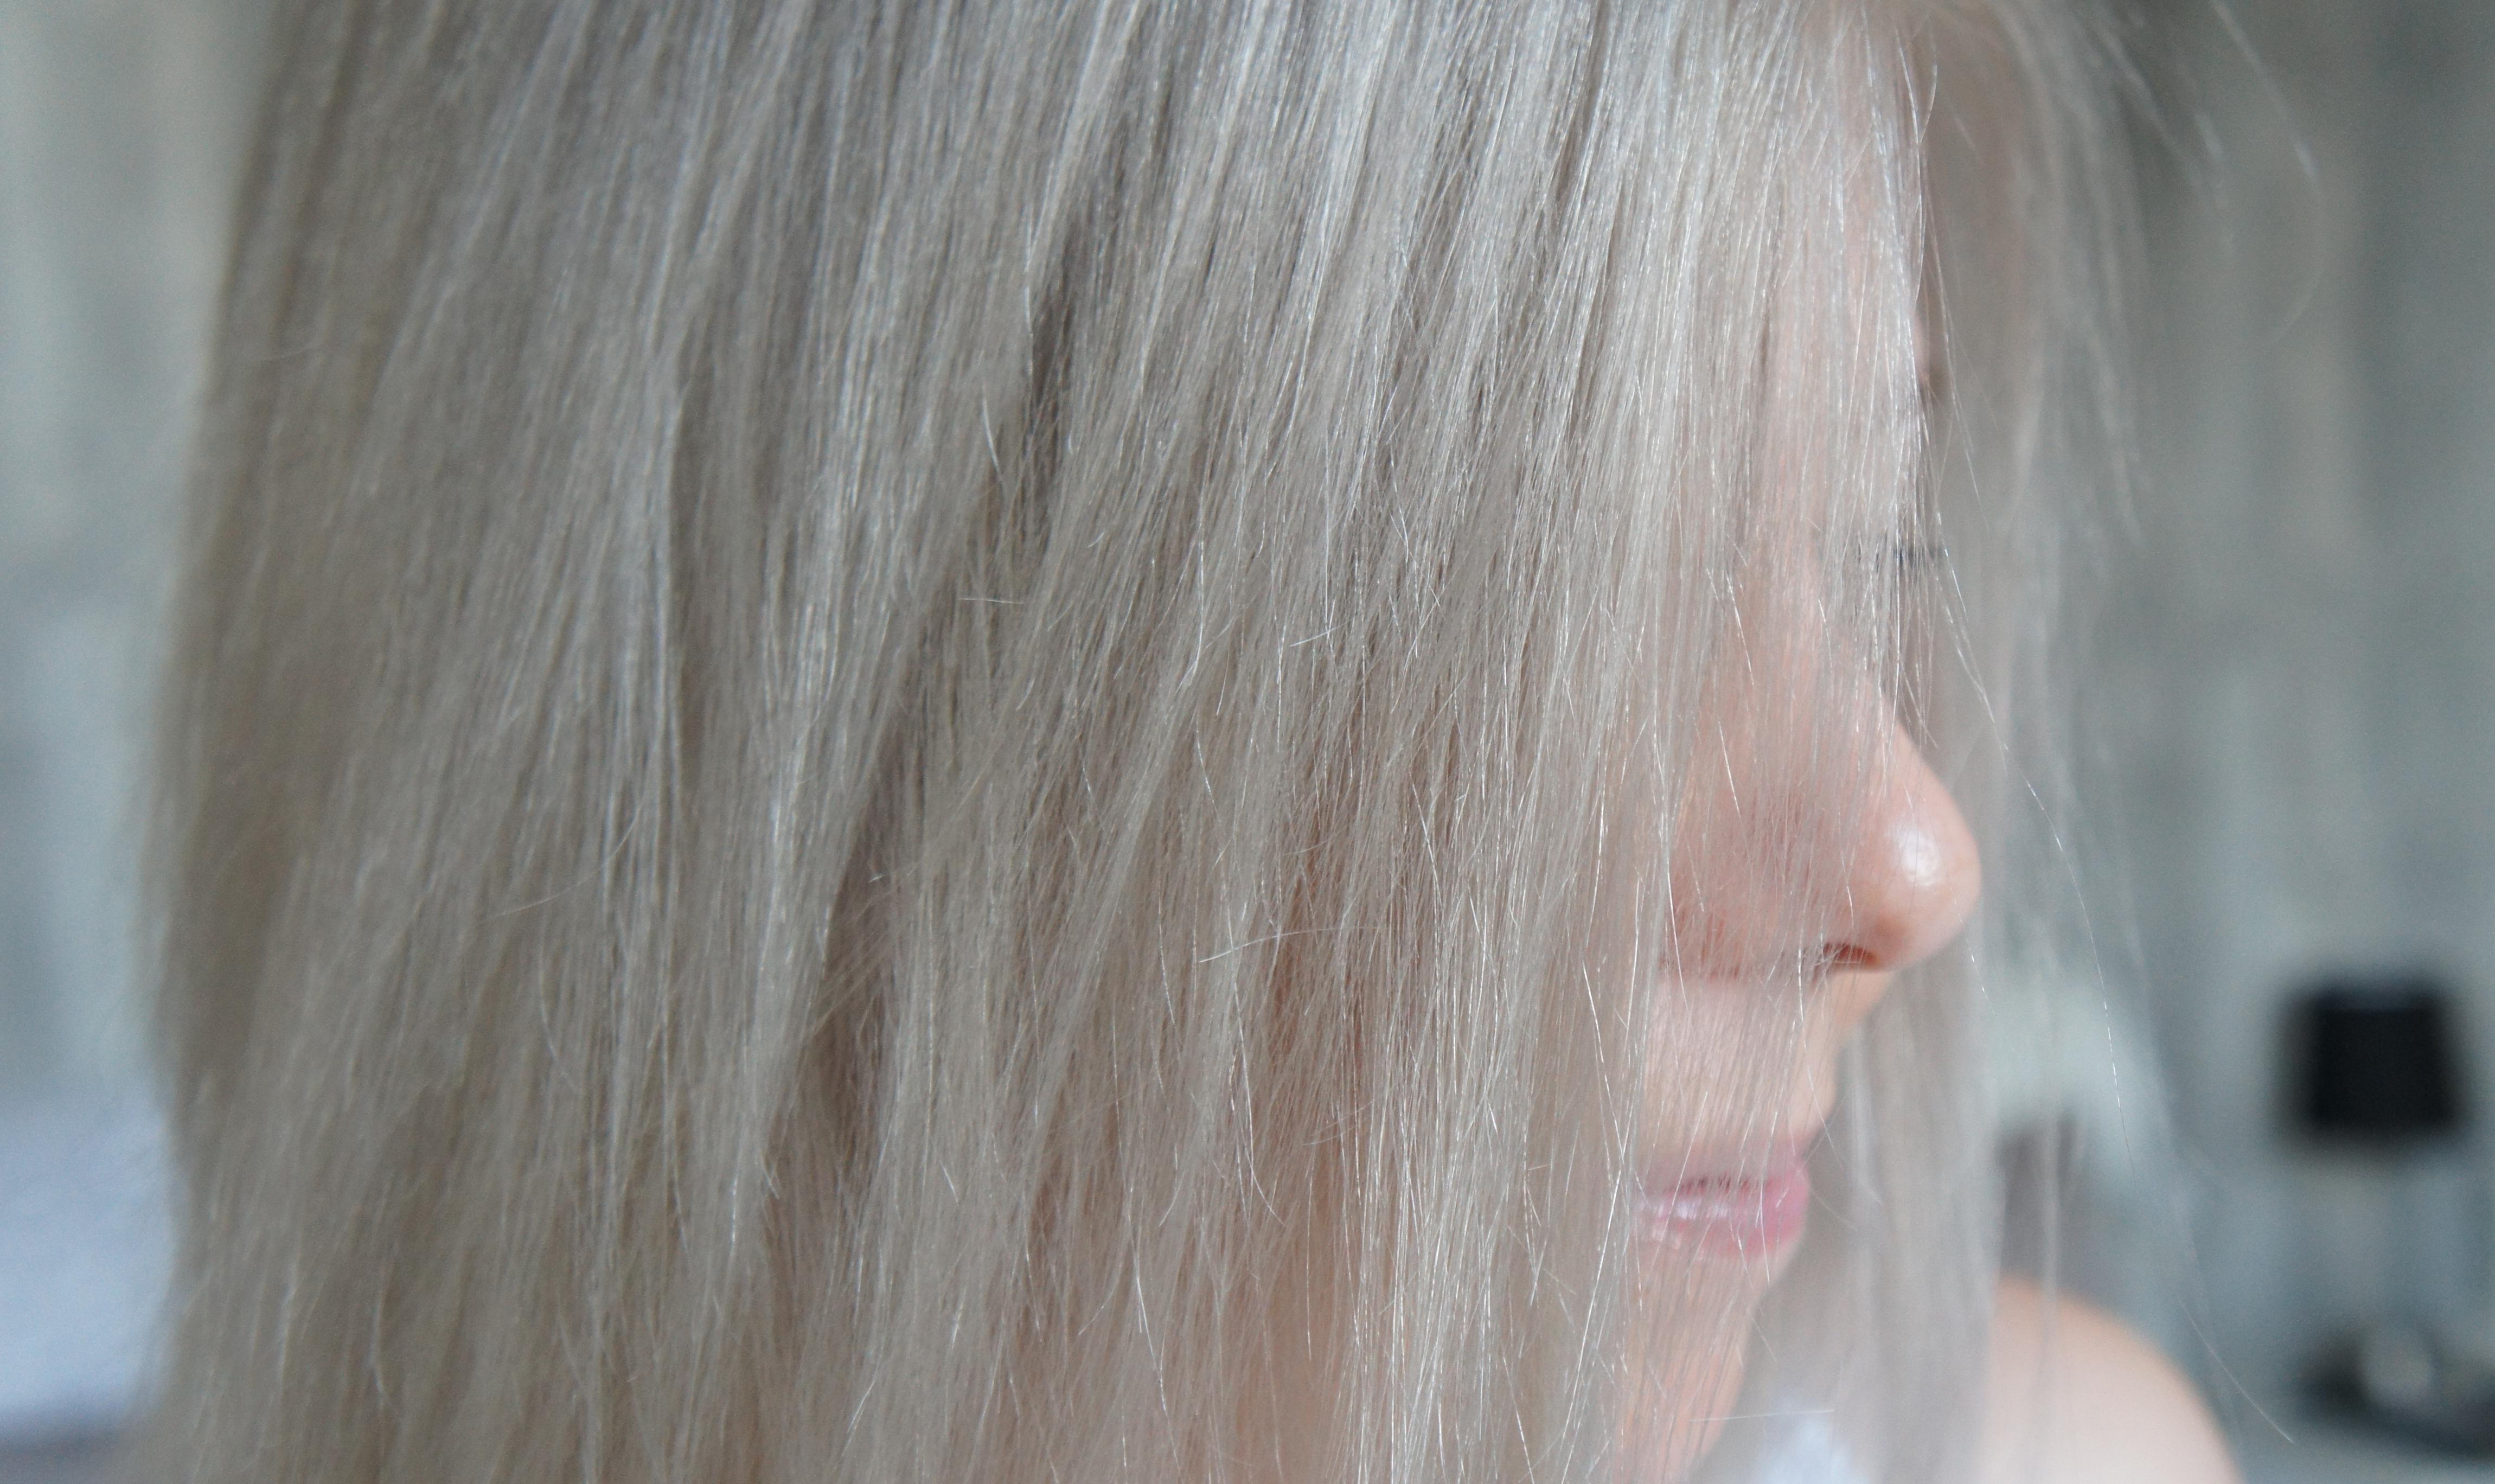 Meine haare sind aschblond dank loreal dialight for 10 minuten haarfarbe